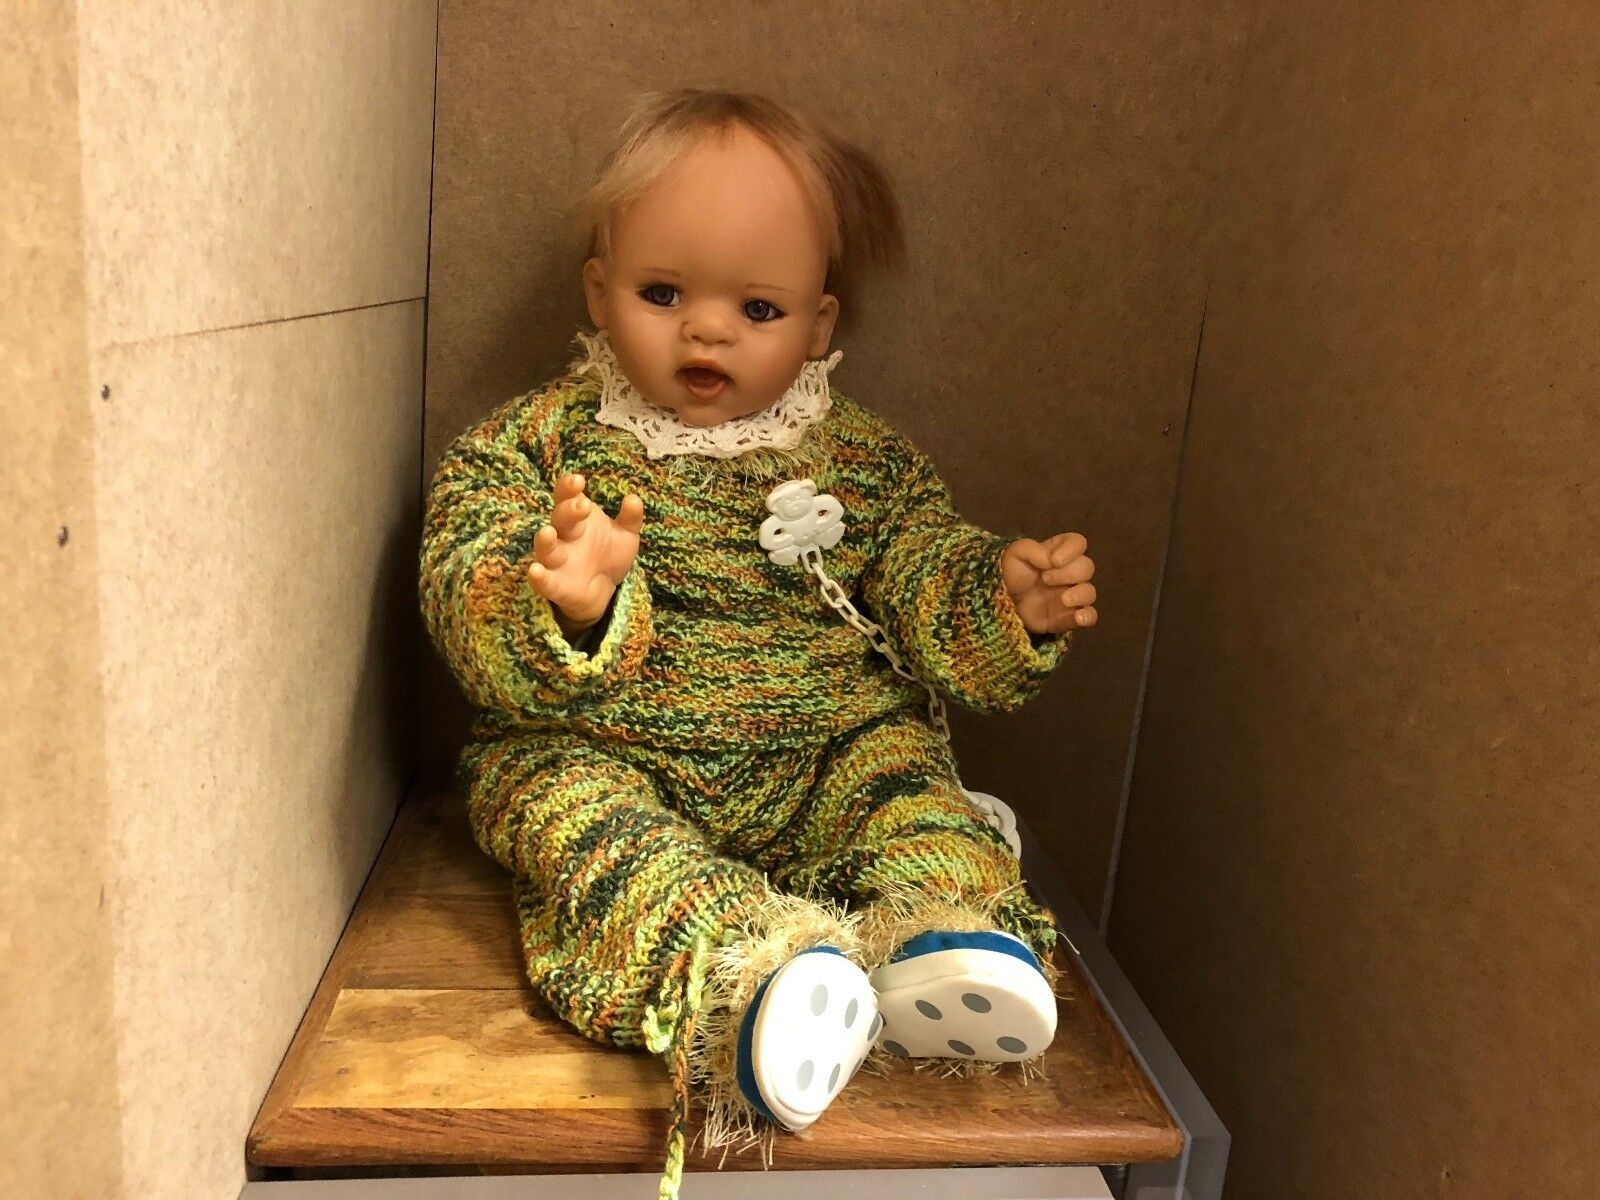 Gaby Jaques Vinyl Puppe 53 cm. Top Zustand